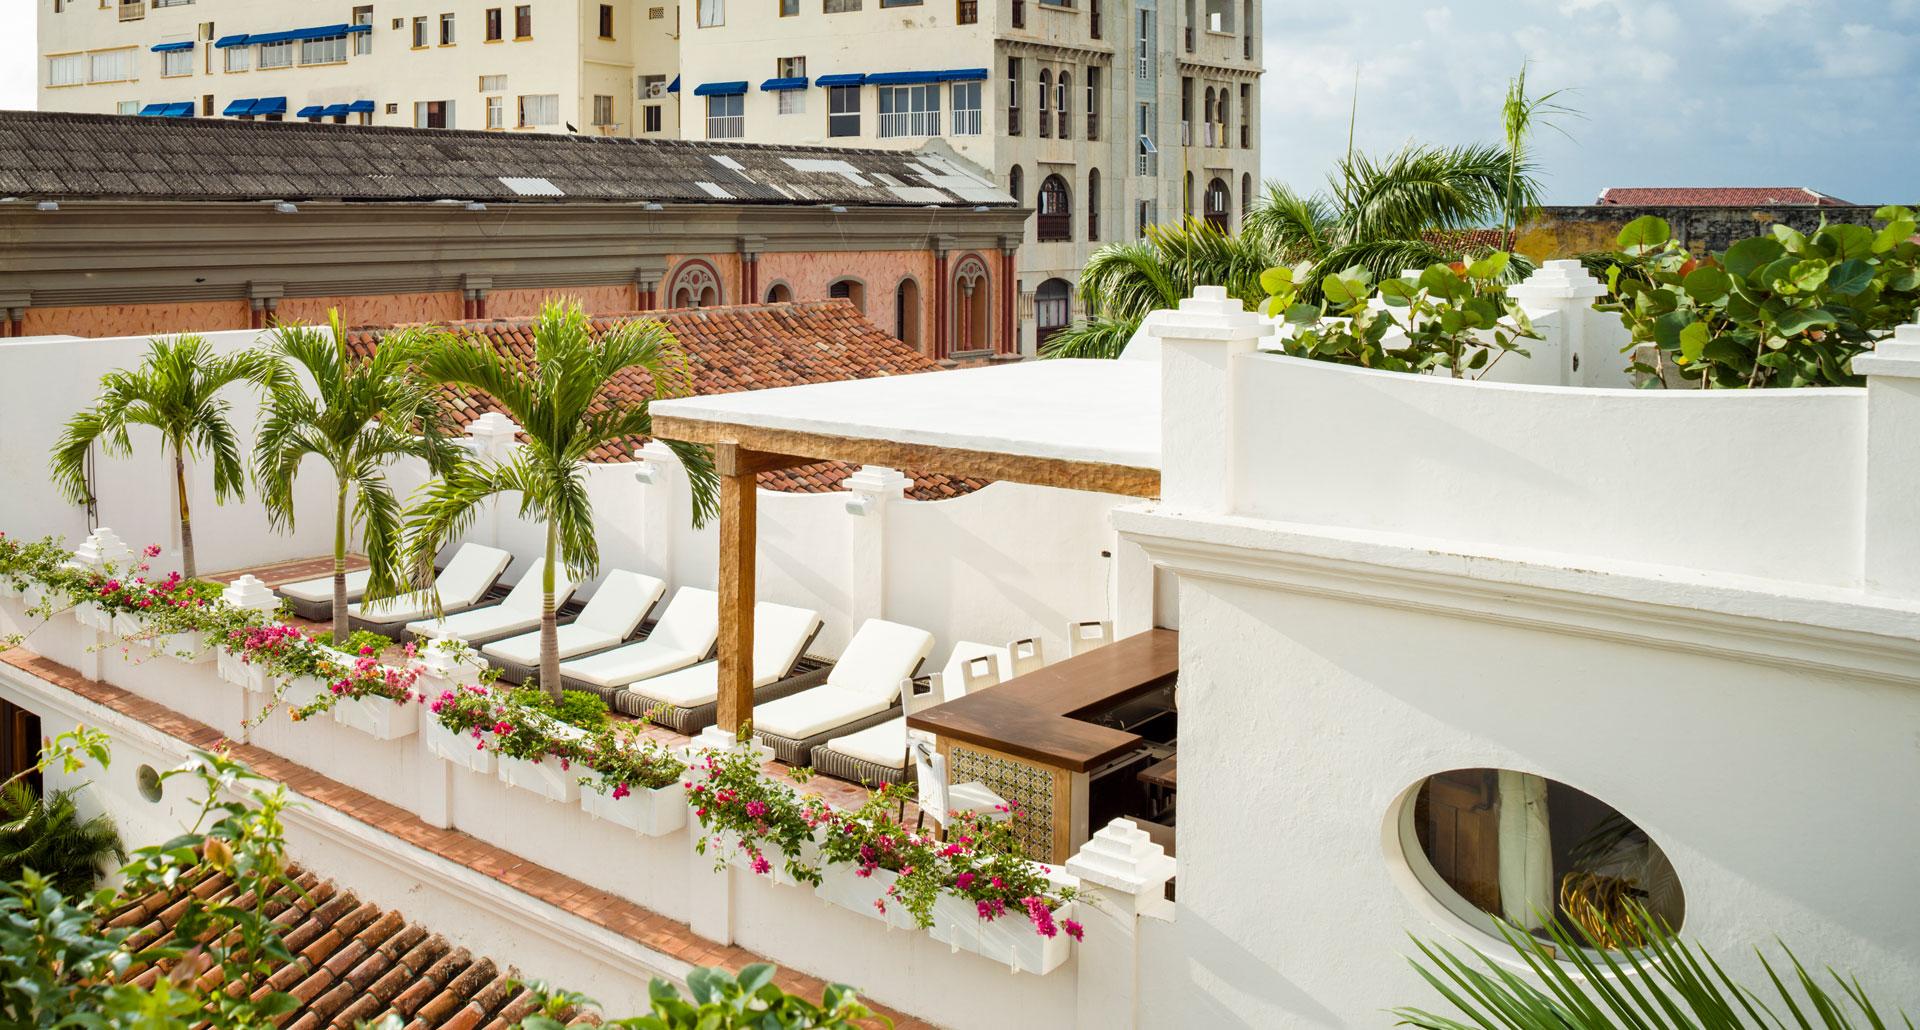 Hotel Casa San Agustin - boutique hotel in Cartagena